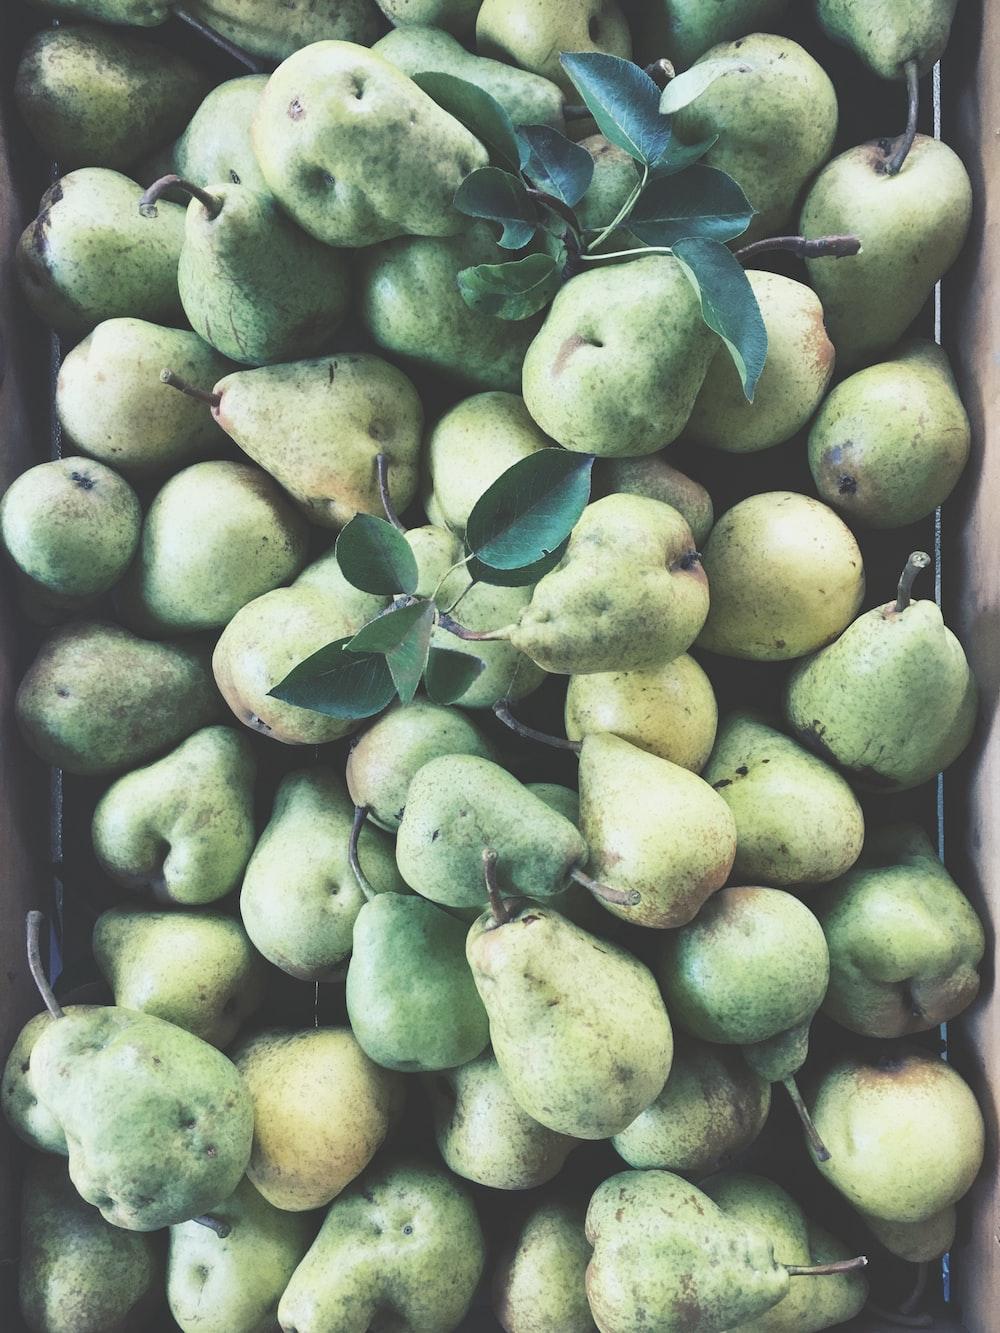 bunch of gourd fruits